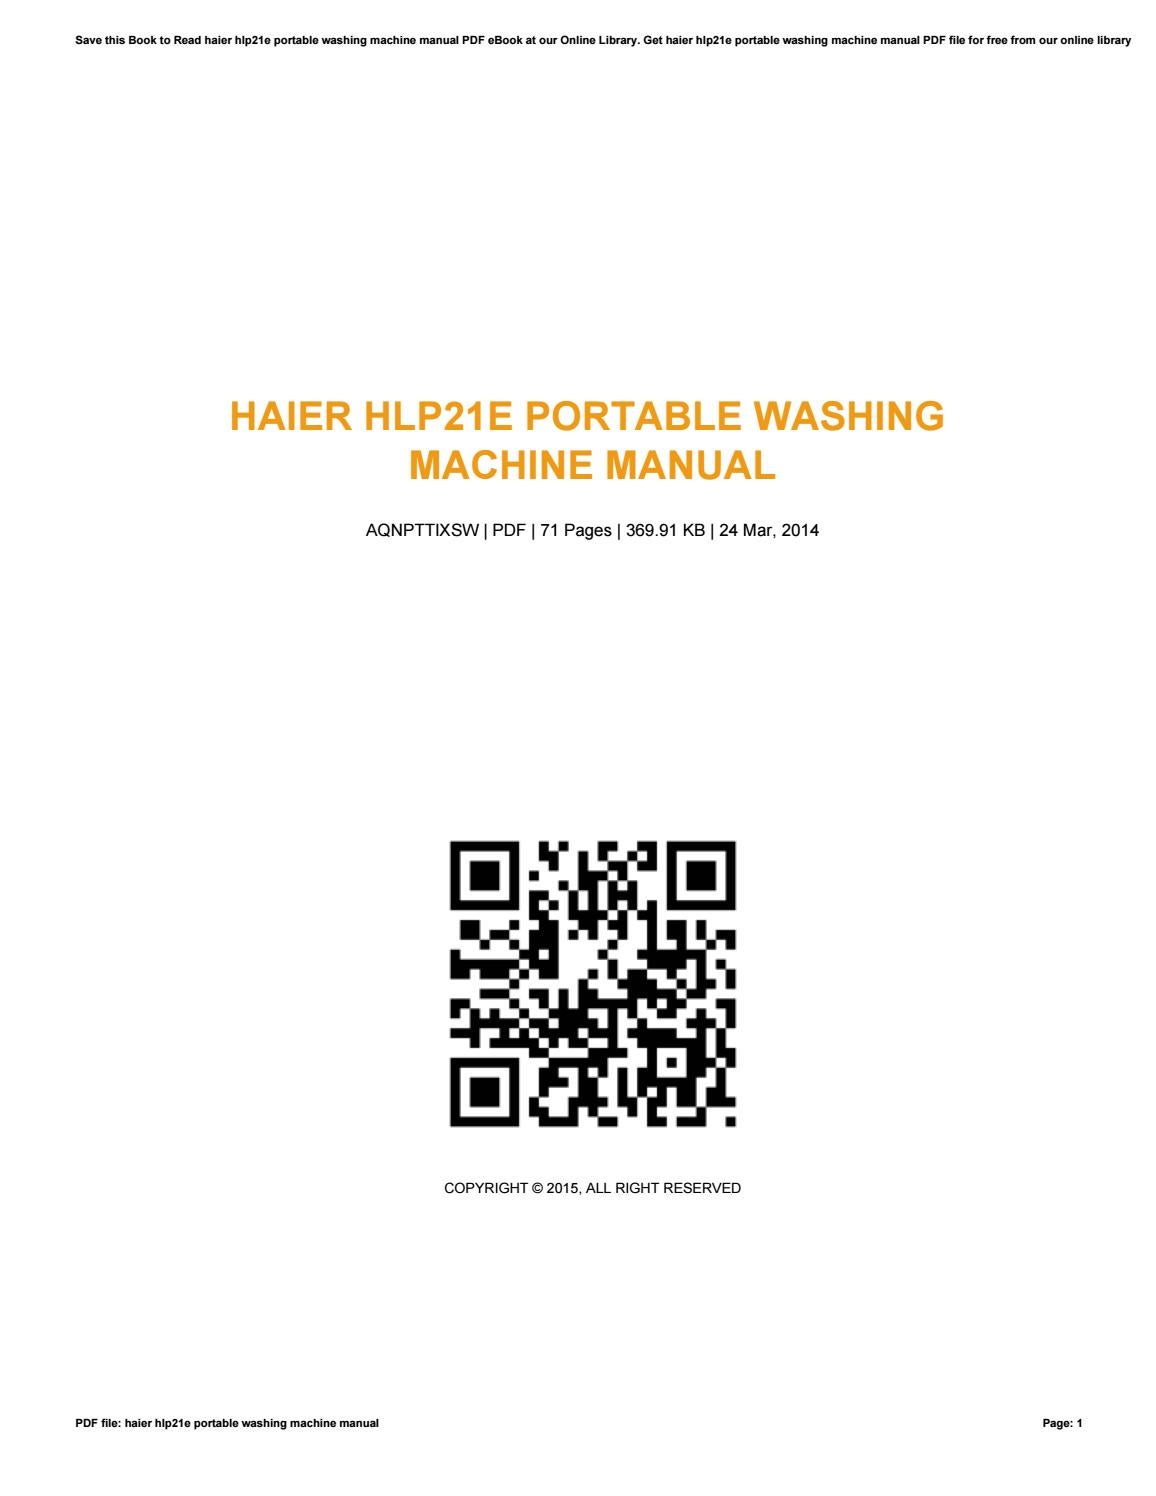 Haier hlp21e portable washing machine manual by ThomasChambers4575 - issuu